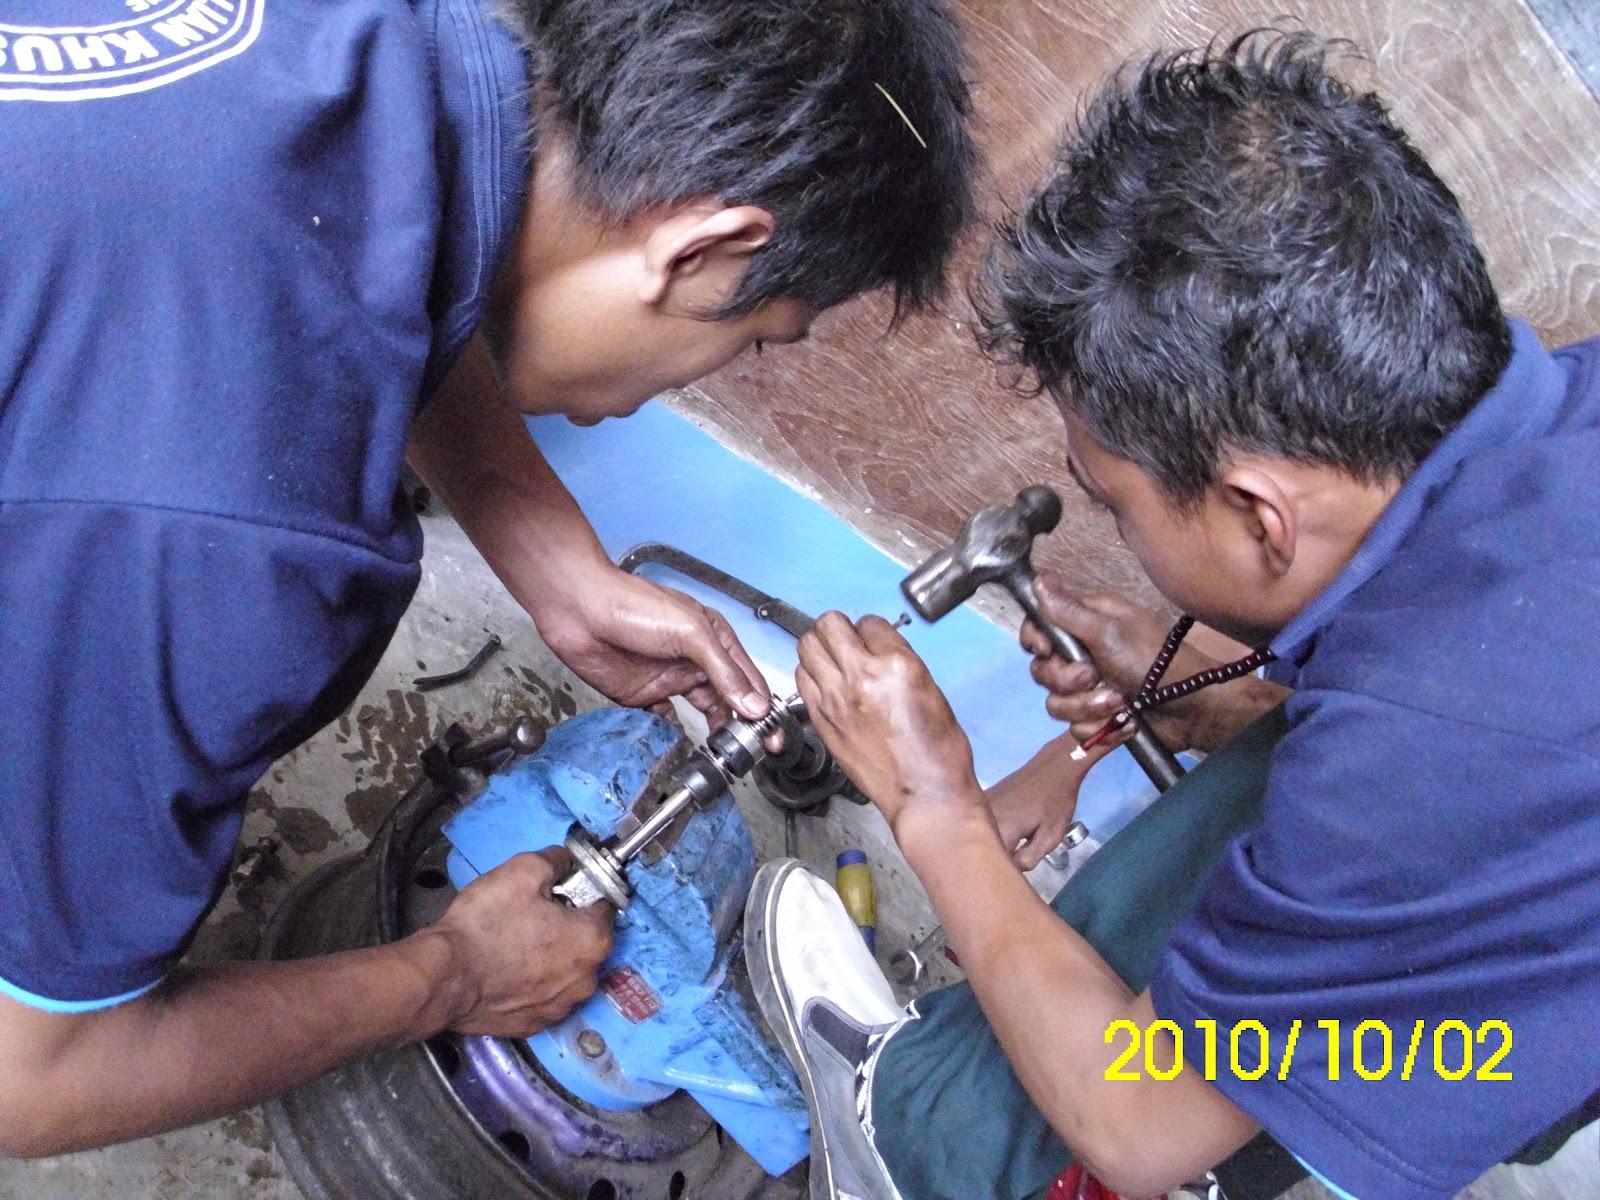 Spesialist Sekok Moes Motor Malang Memperbaiki Shock Becker Belakang Seal Honda